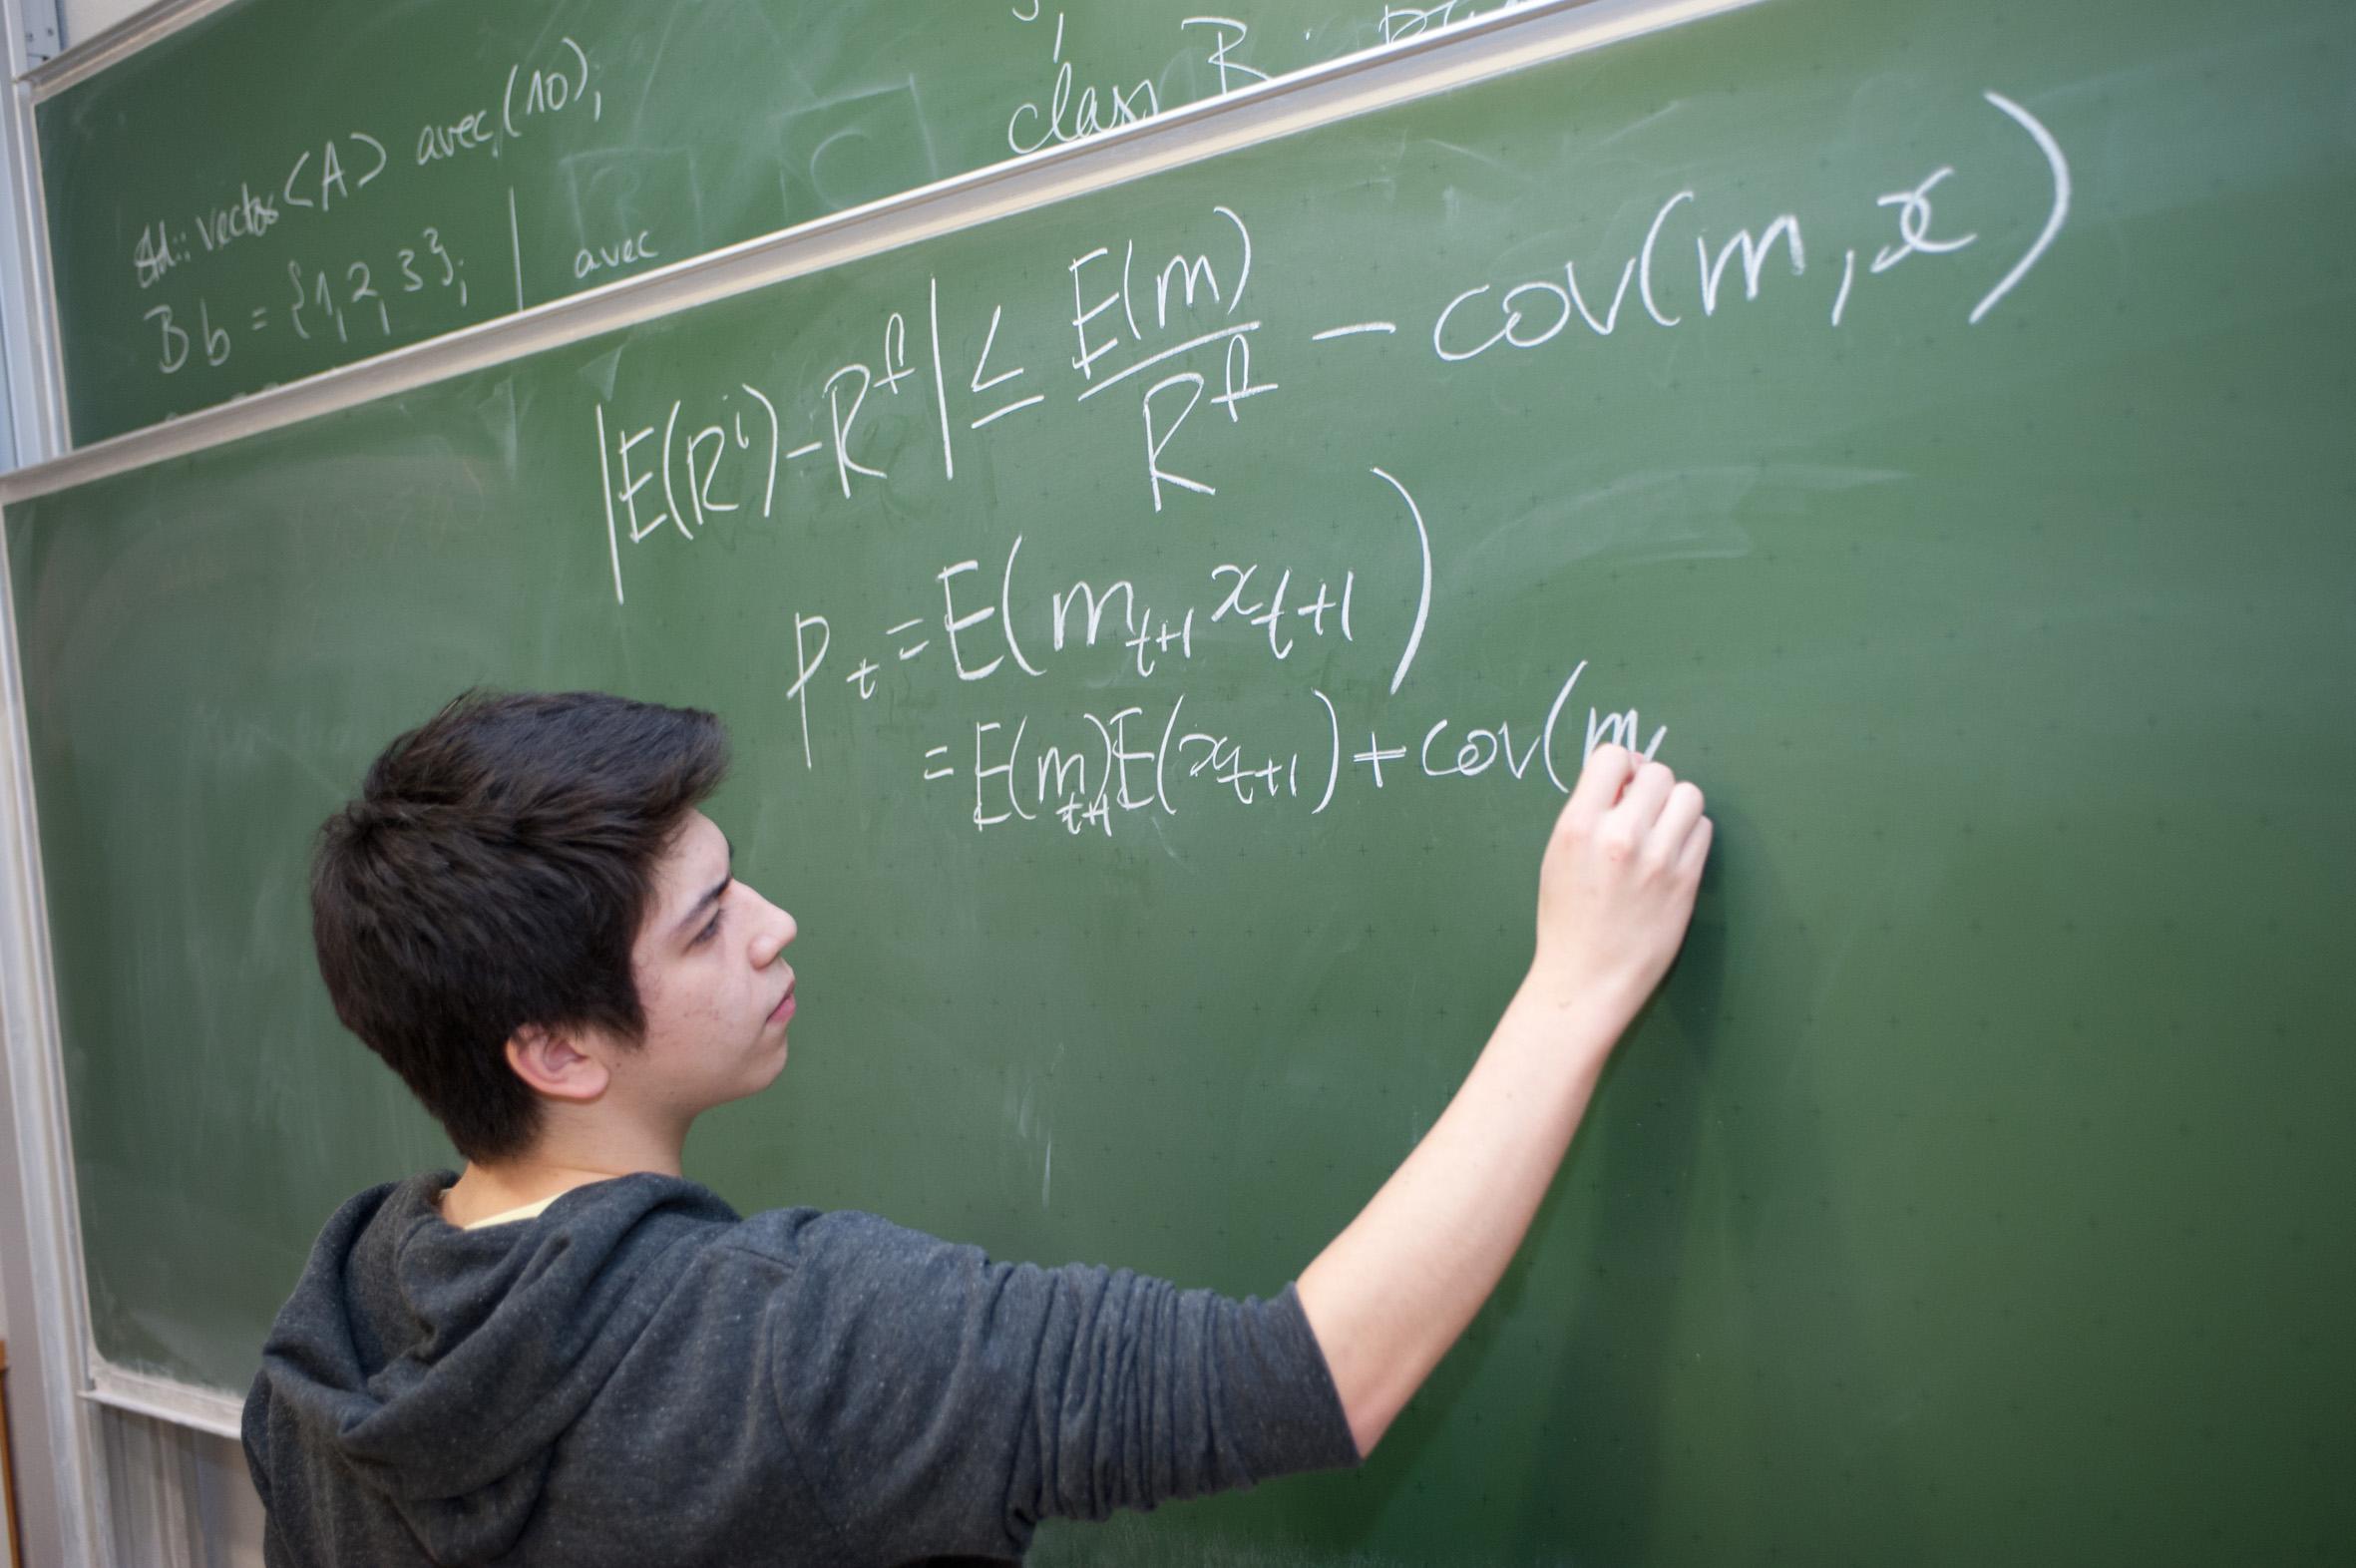 Mathematik-Student an der universität Ulm. Foto: Elvira Eberhardt / Uni Ulm